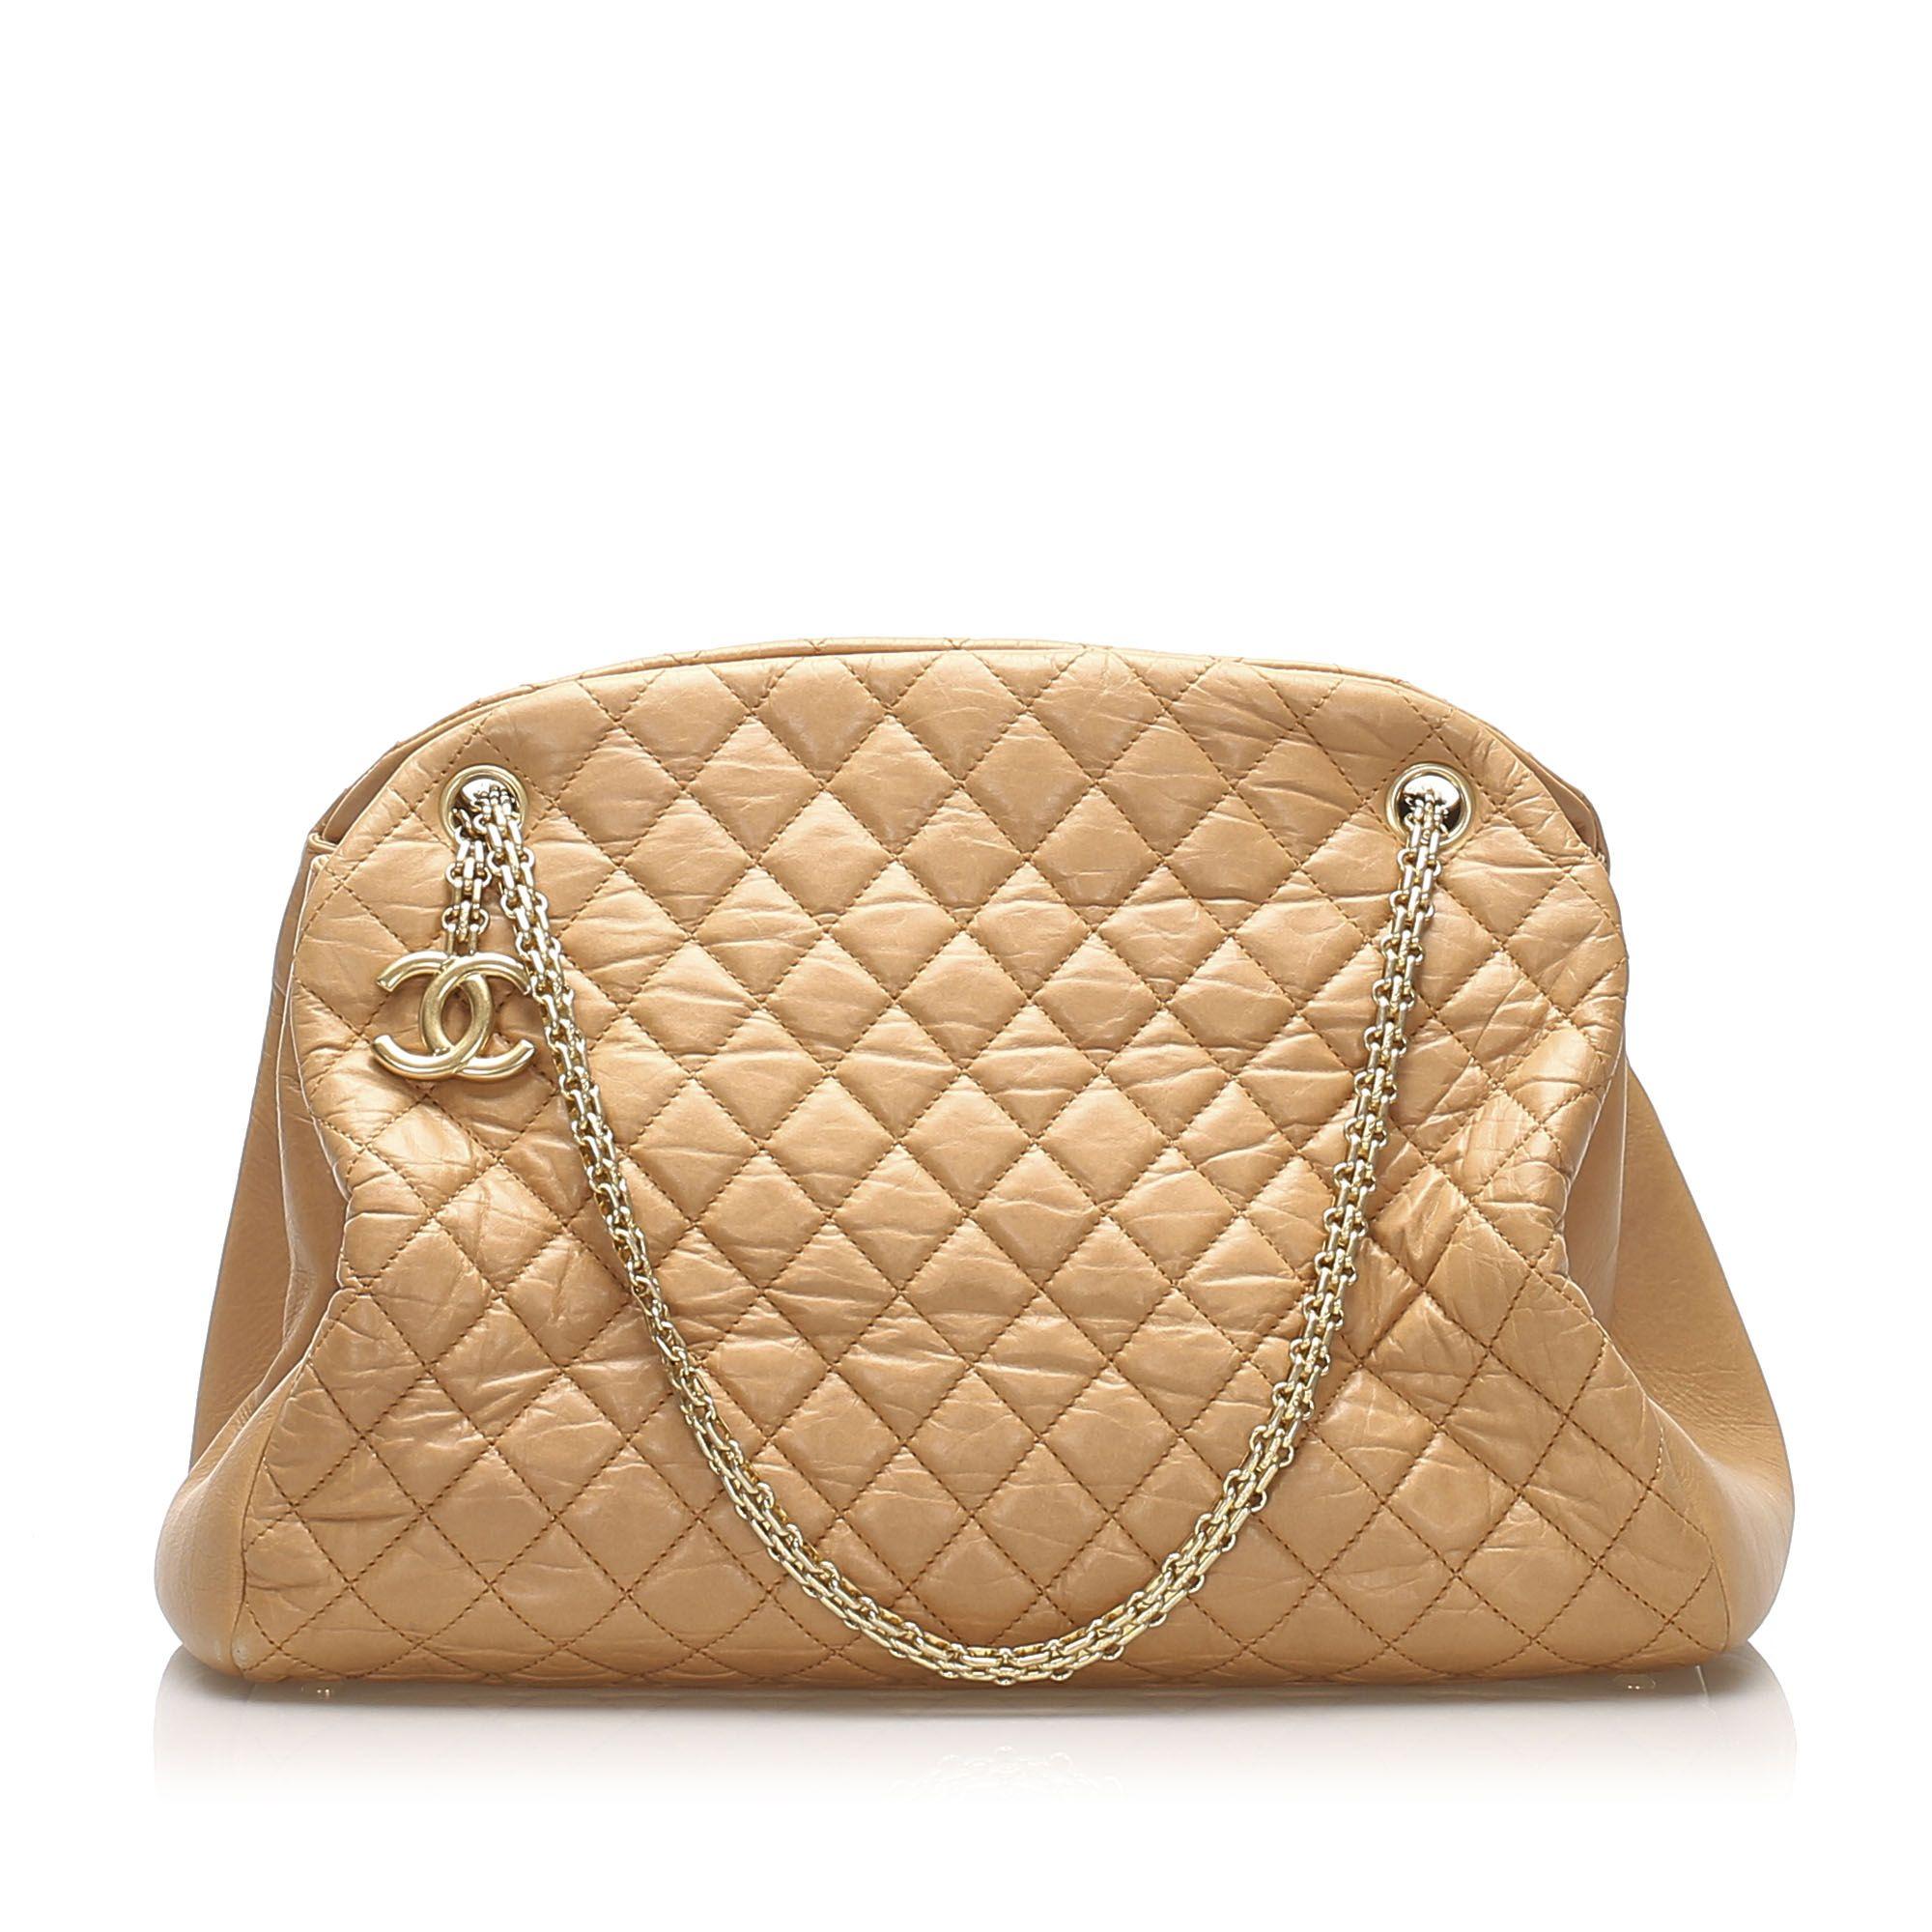 Vintage Chanel Mademoiselle Bowling Bag Brown